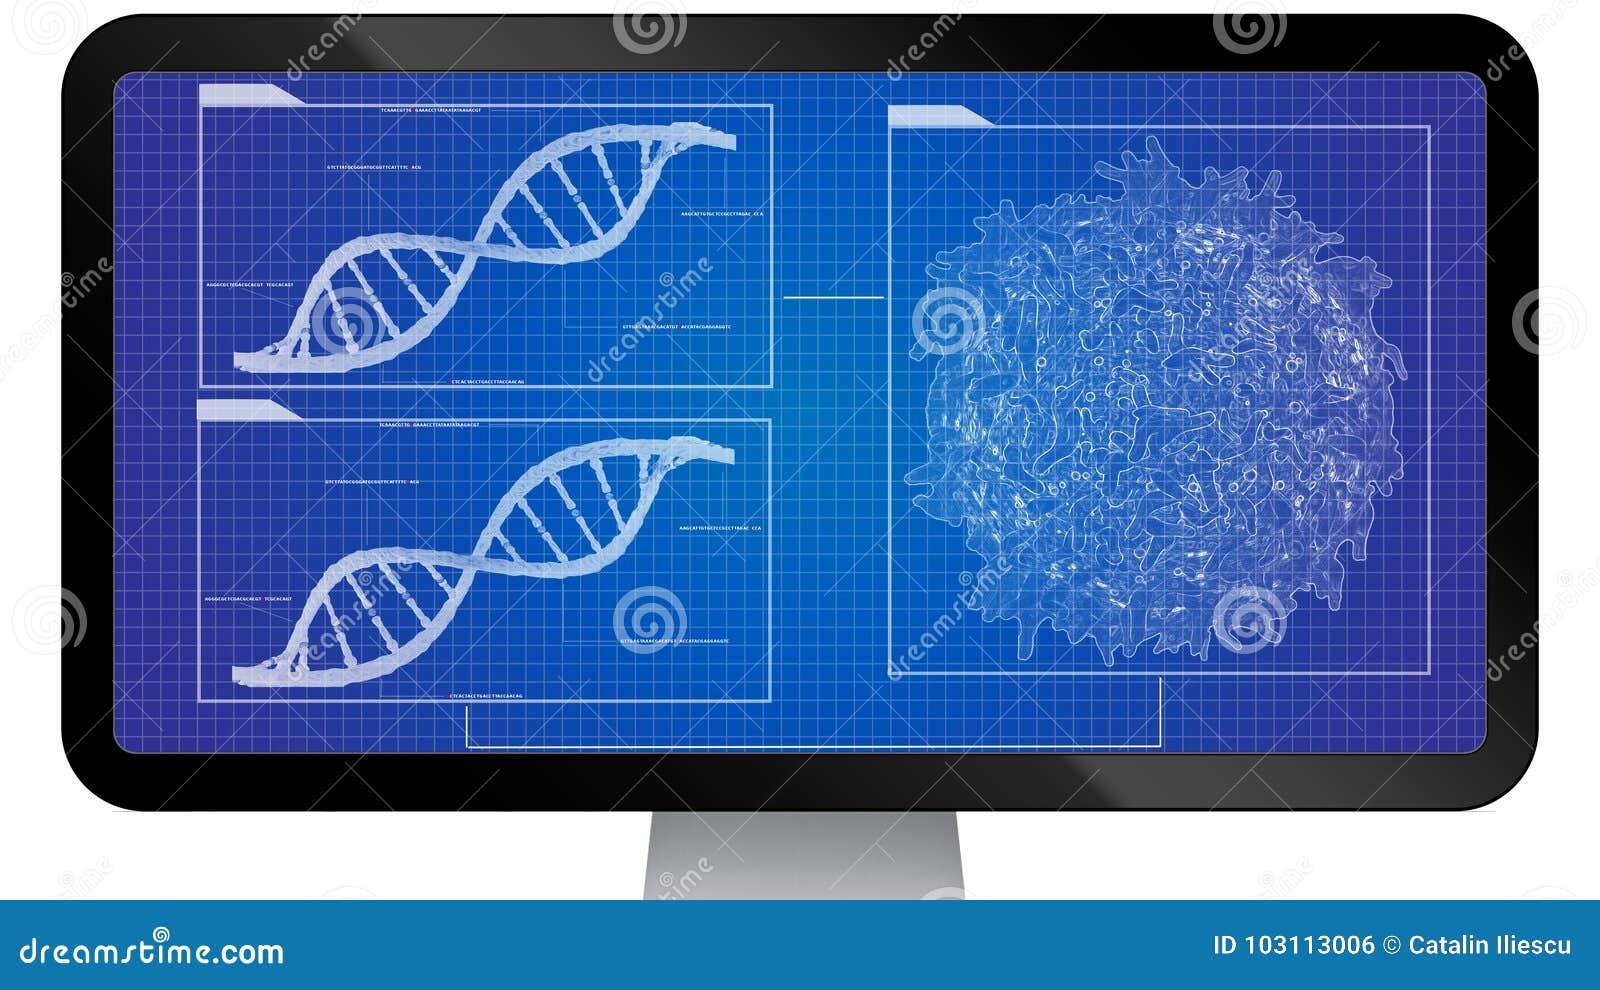 Dna sequencing blueprint rna sequencing dna computational models dna sequencing blueprint rna sequencing dna computational models genome helix background gene crispr helix malvernweather Choice Image